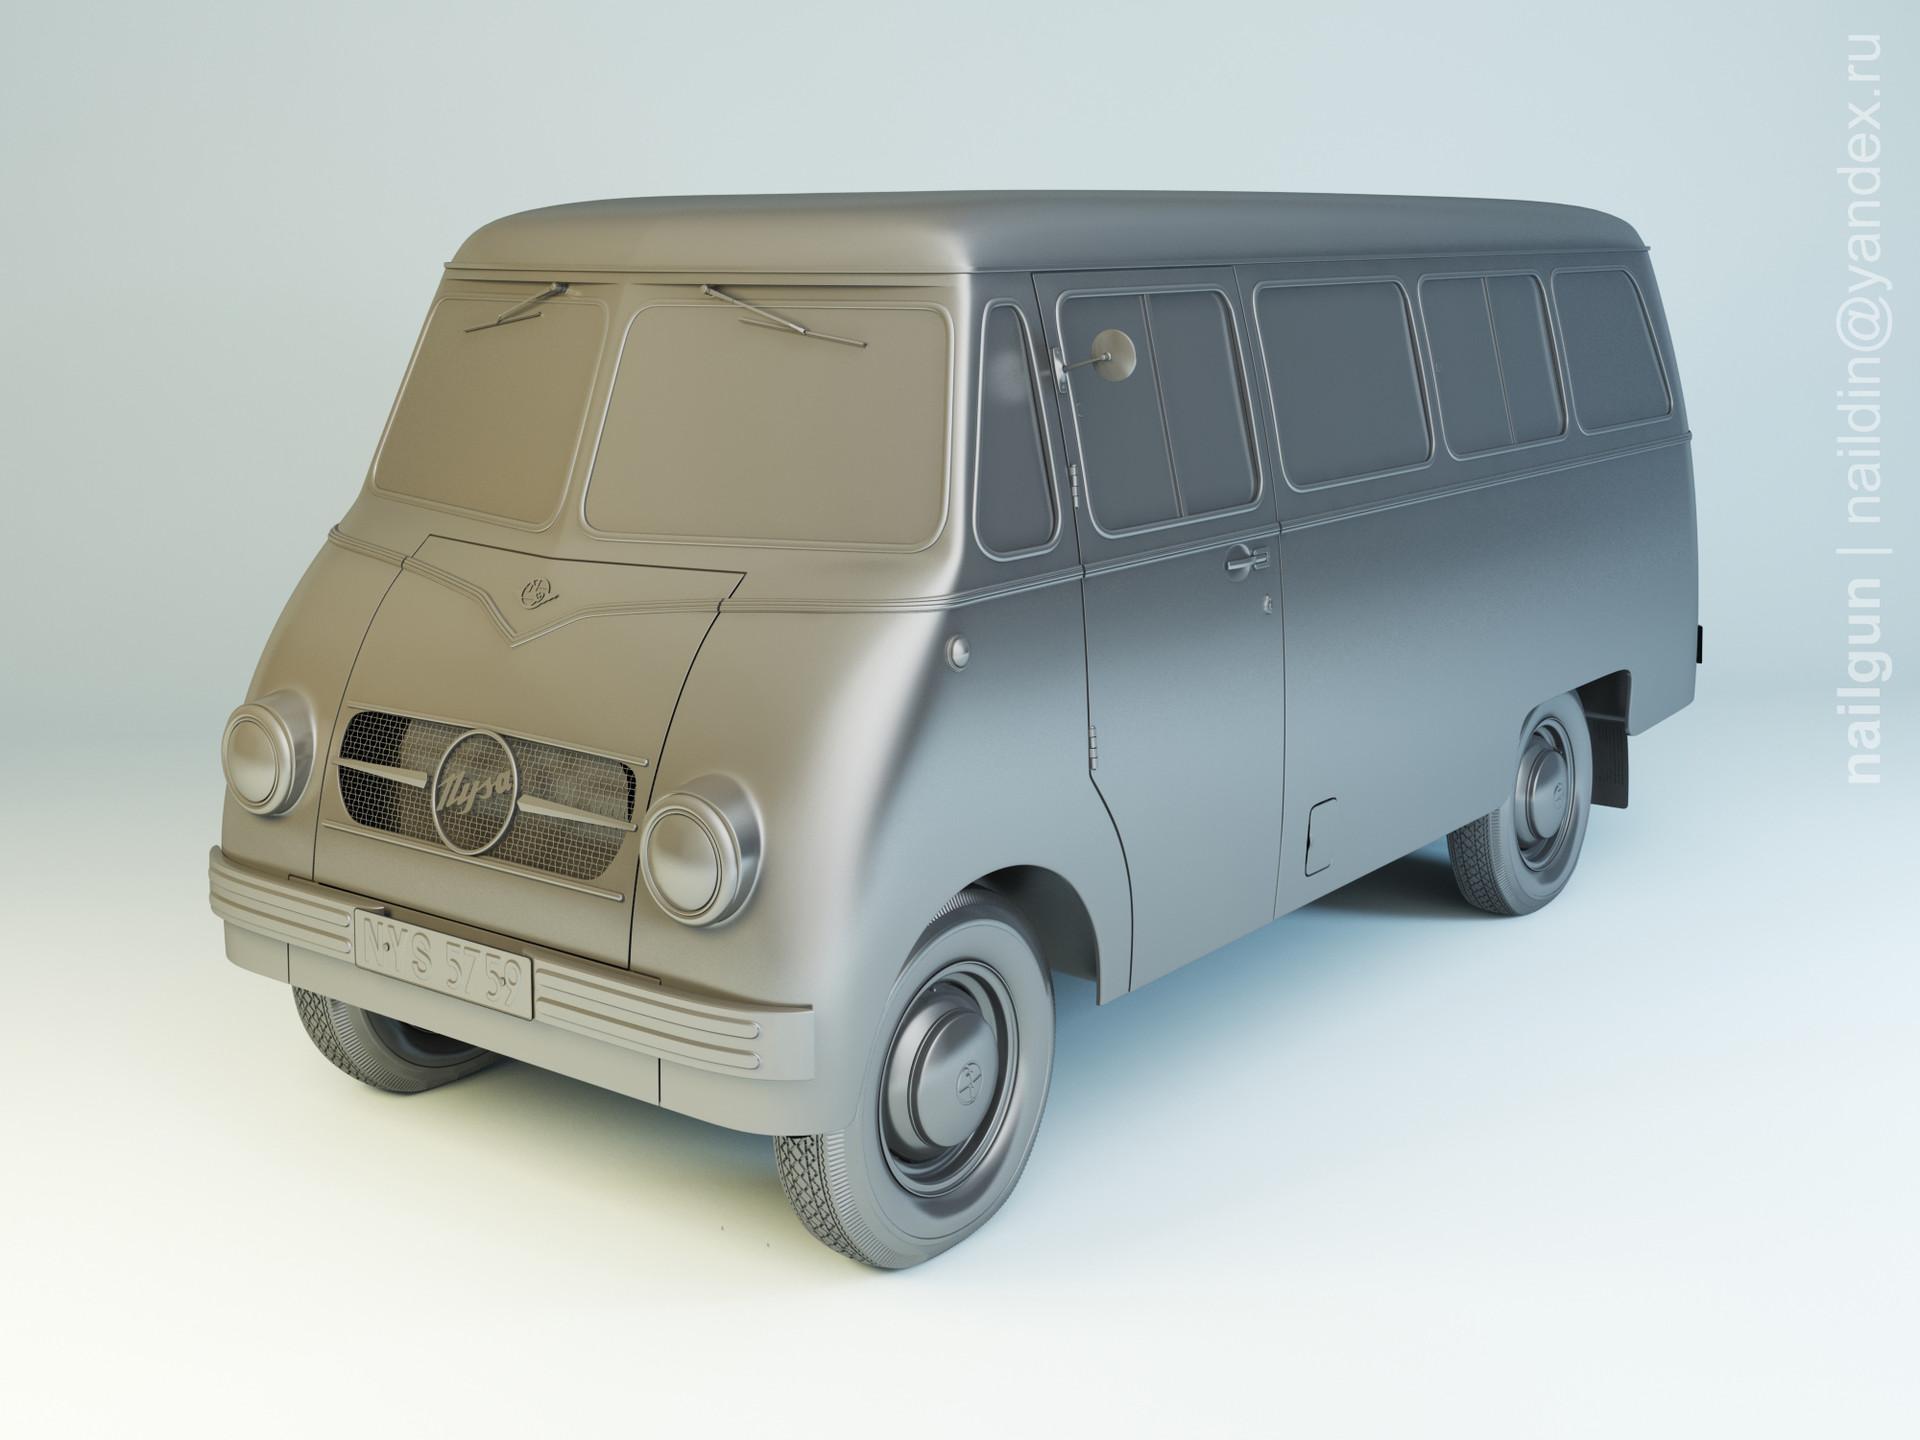 Nail khusnutdinov als 159 002 nysa n59 modelling 0